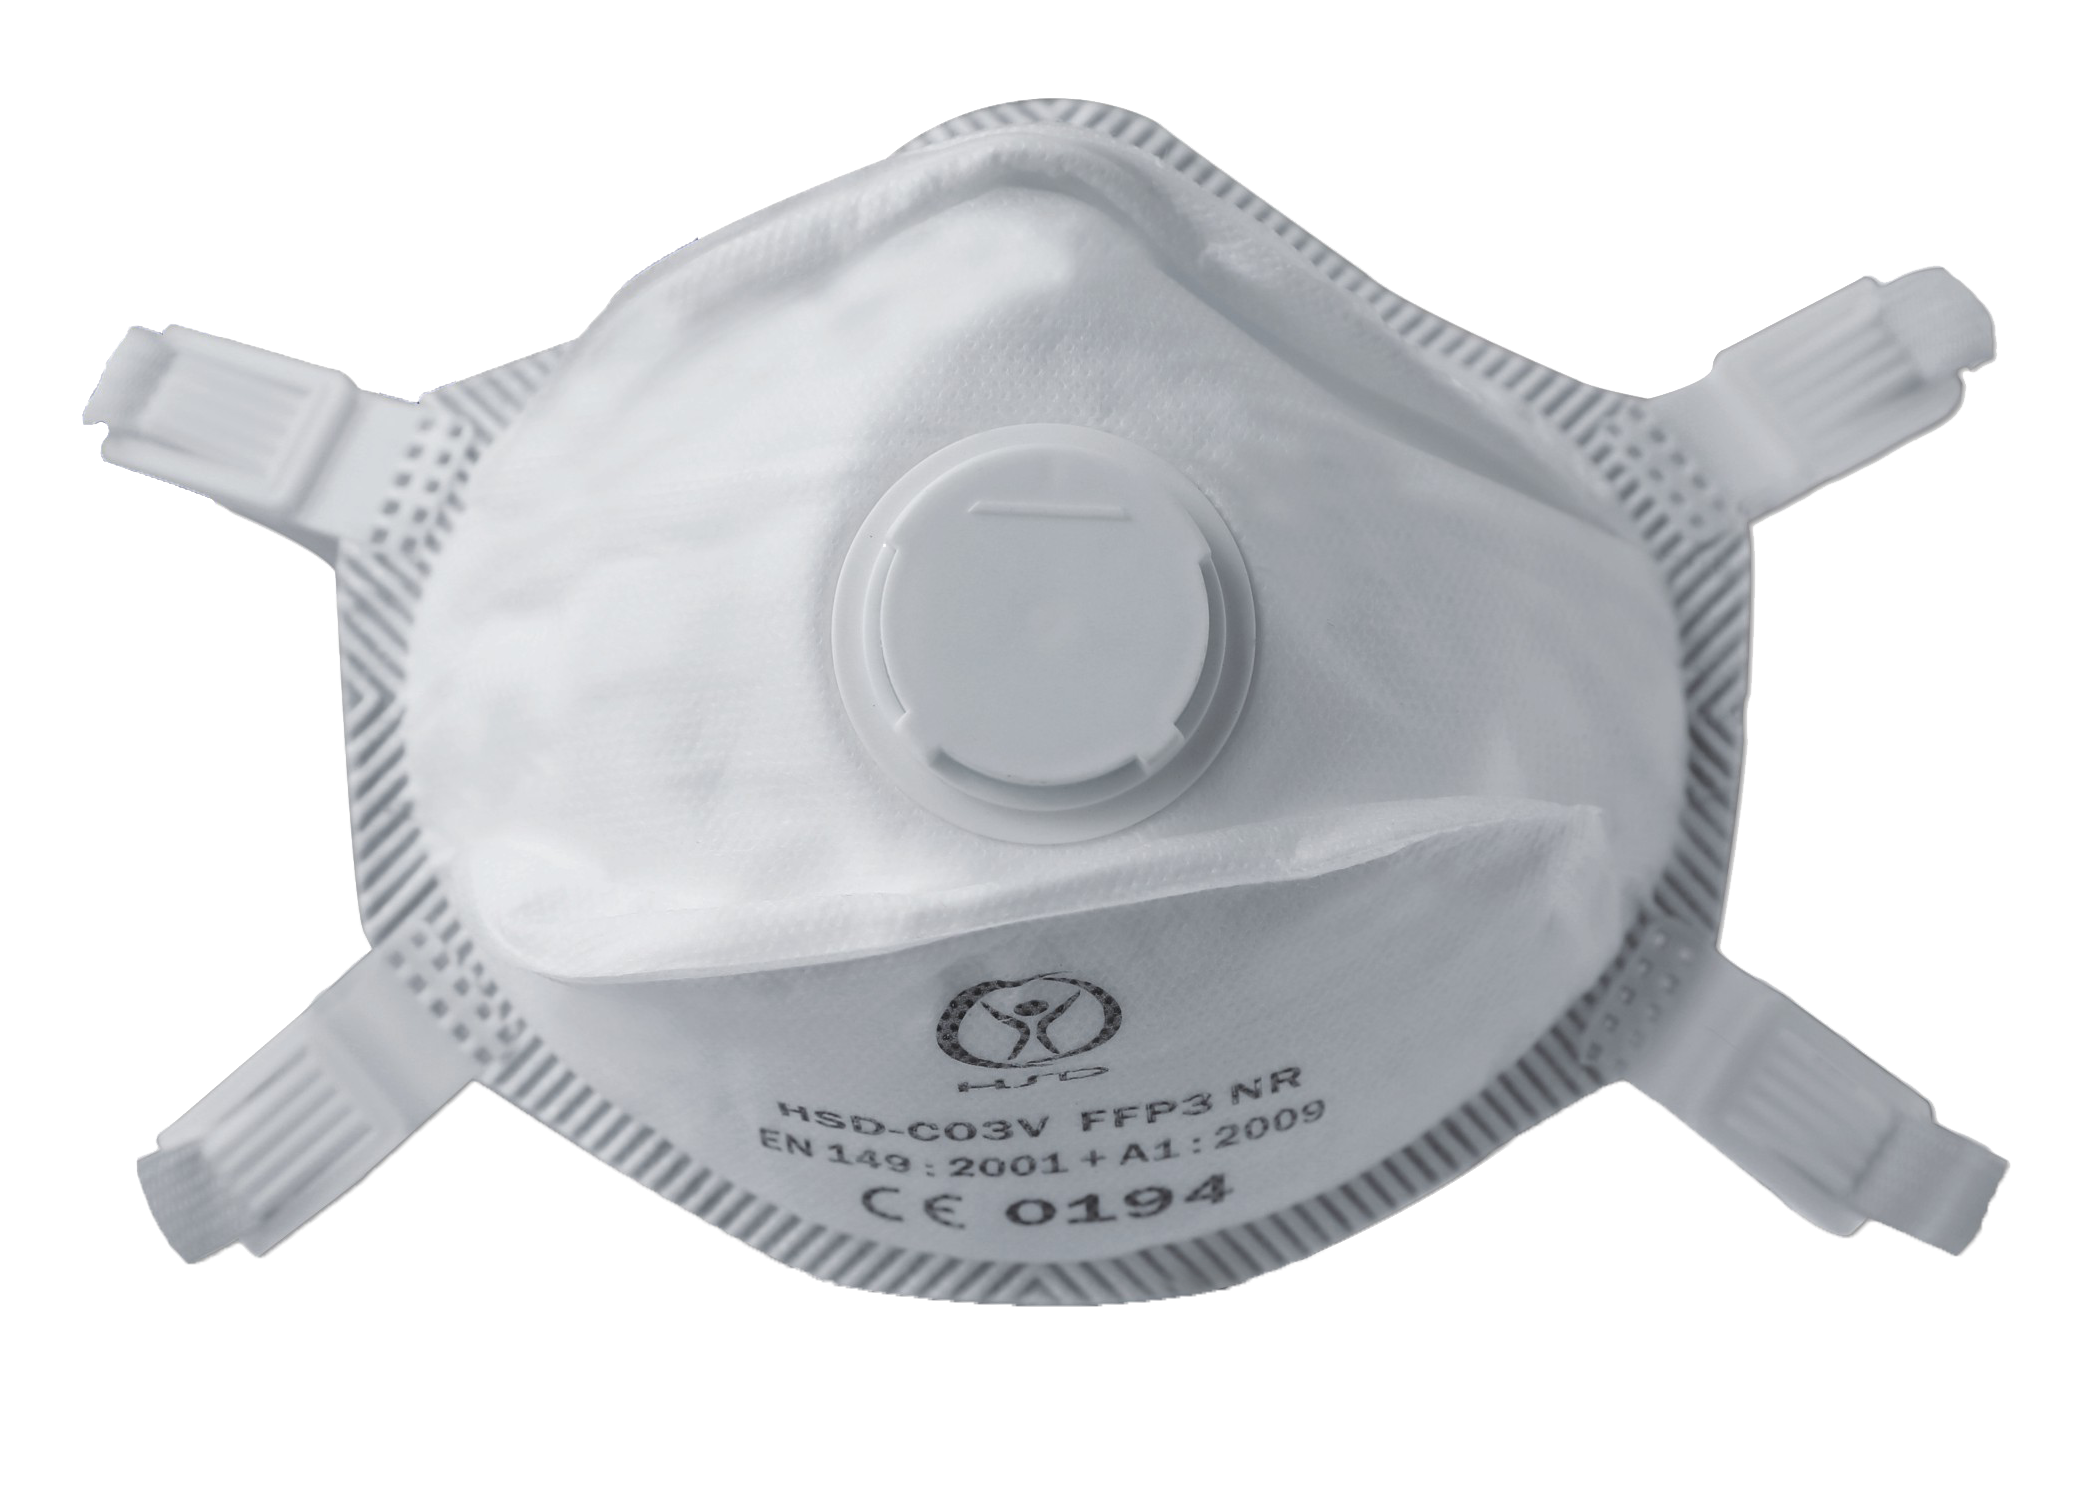 FFP3 masker met filter per 20 stuks